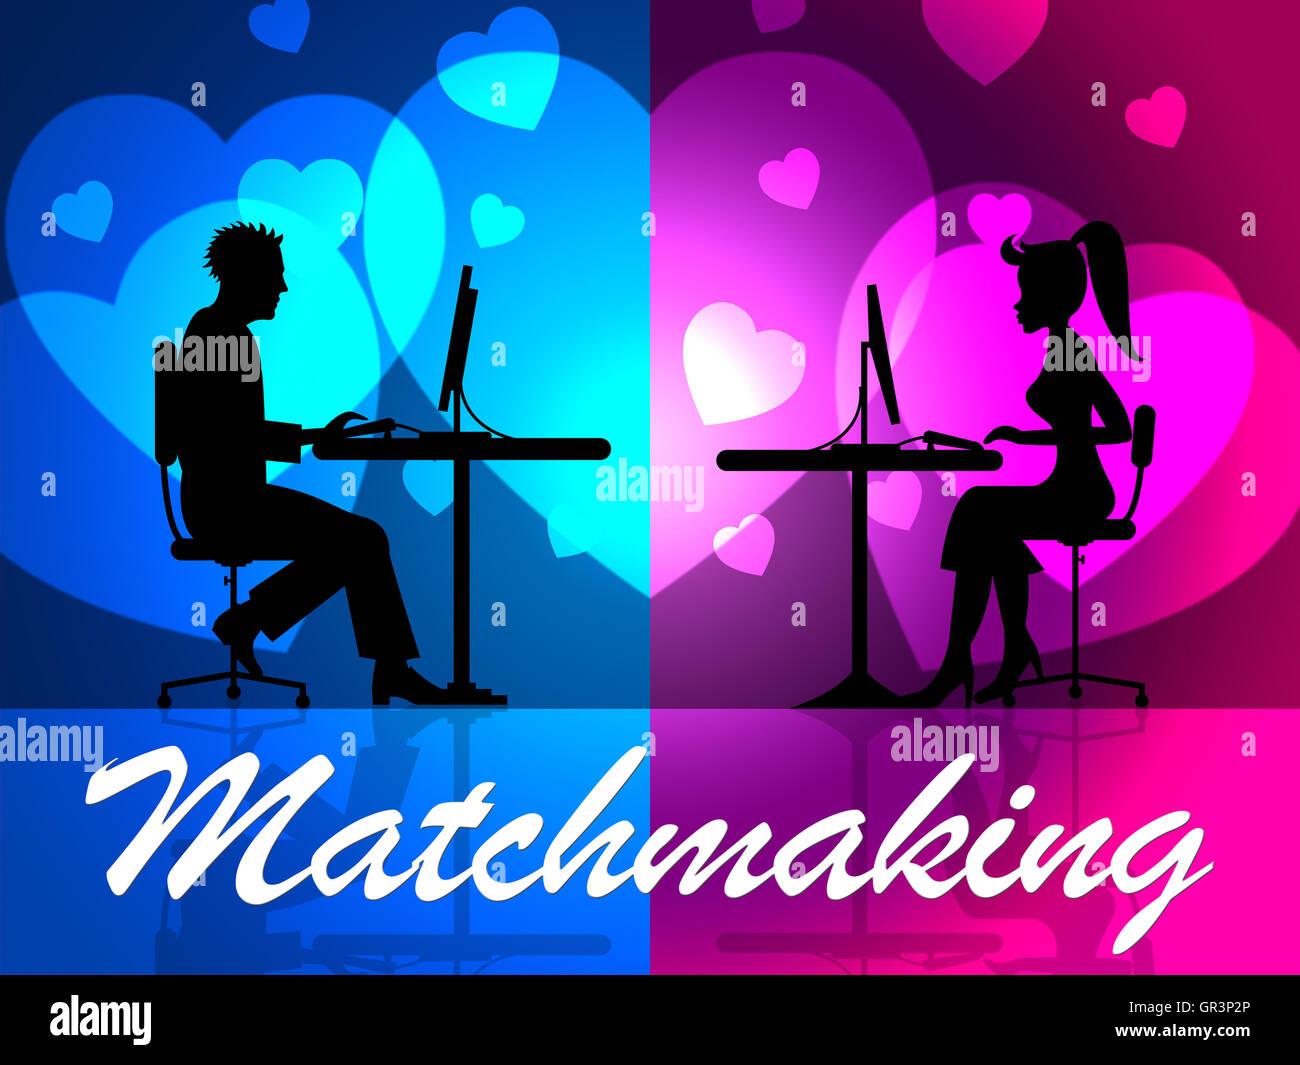 internet matchmaking